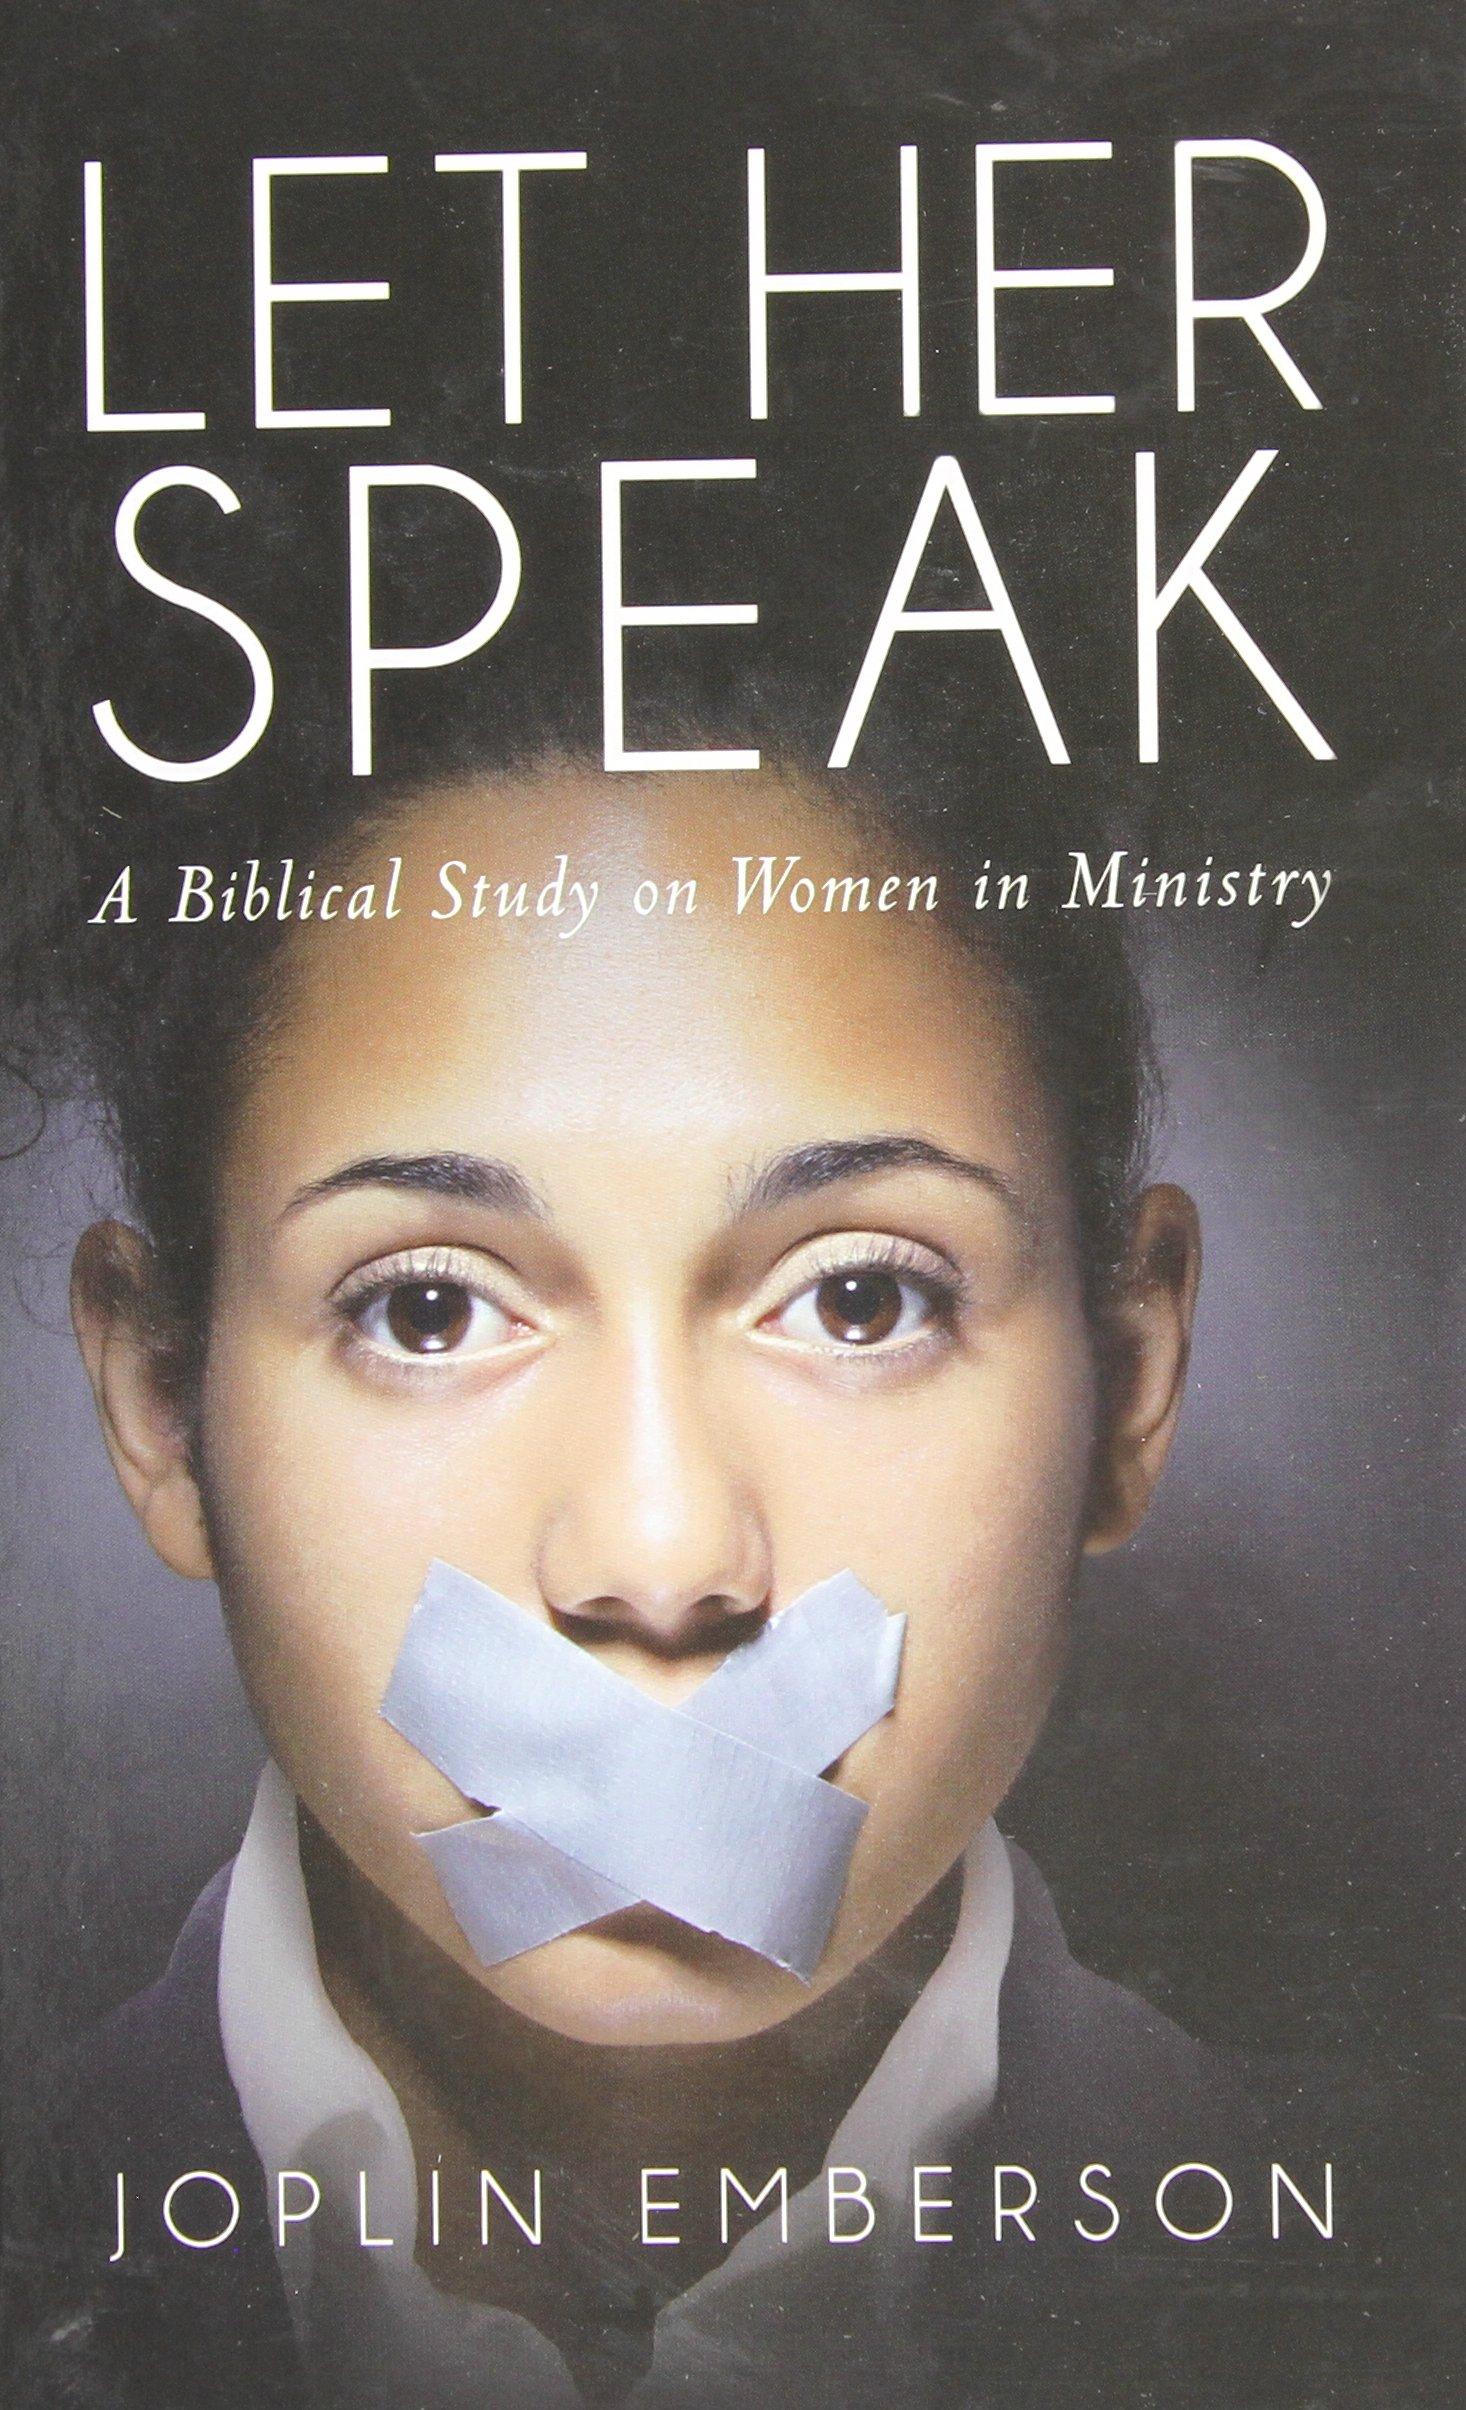 Let Her Speak: Joplin Emberson: 9781631851469: Amazon com: Books